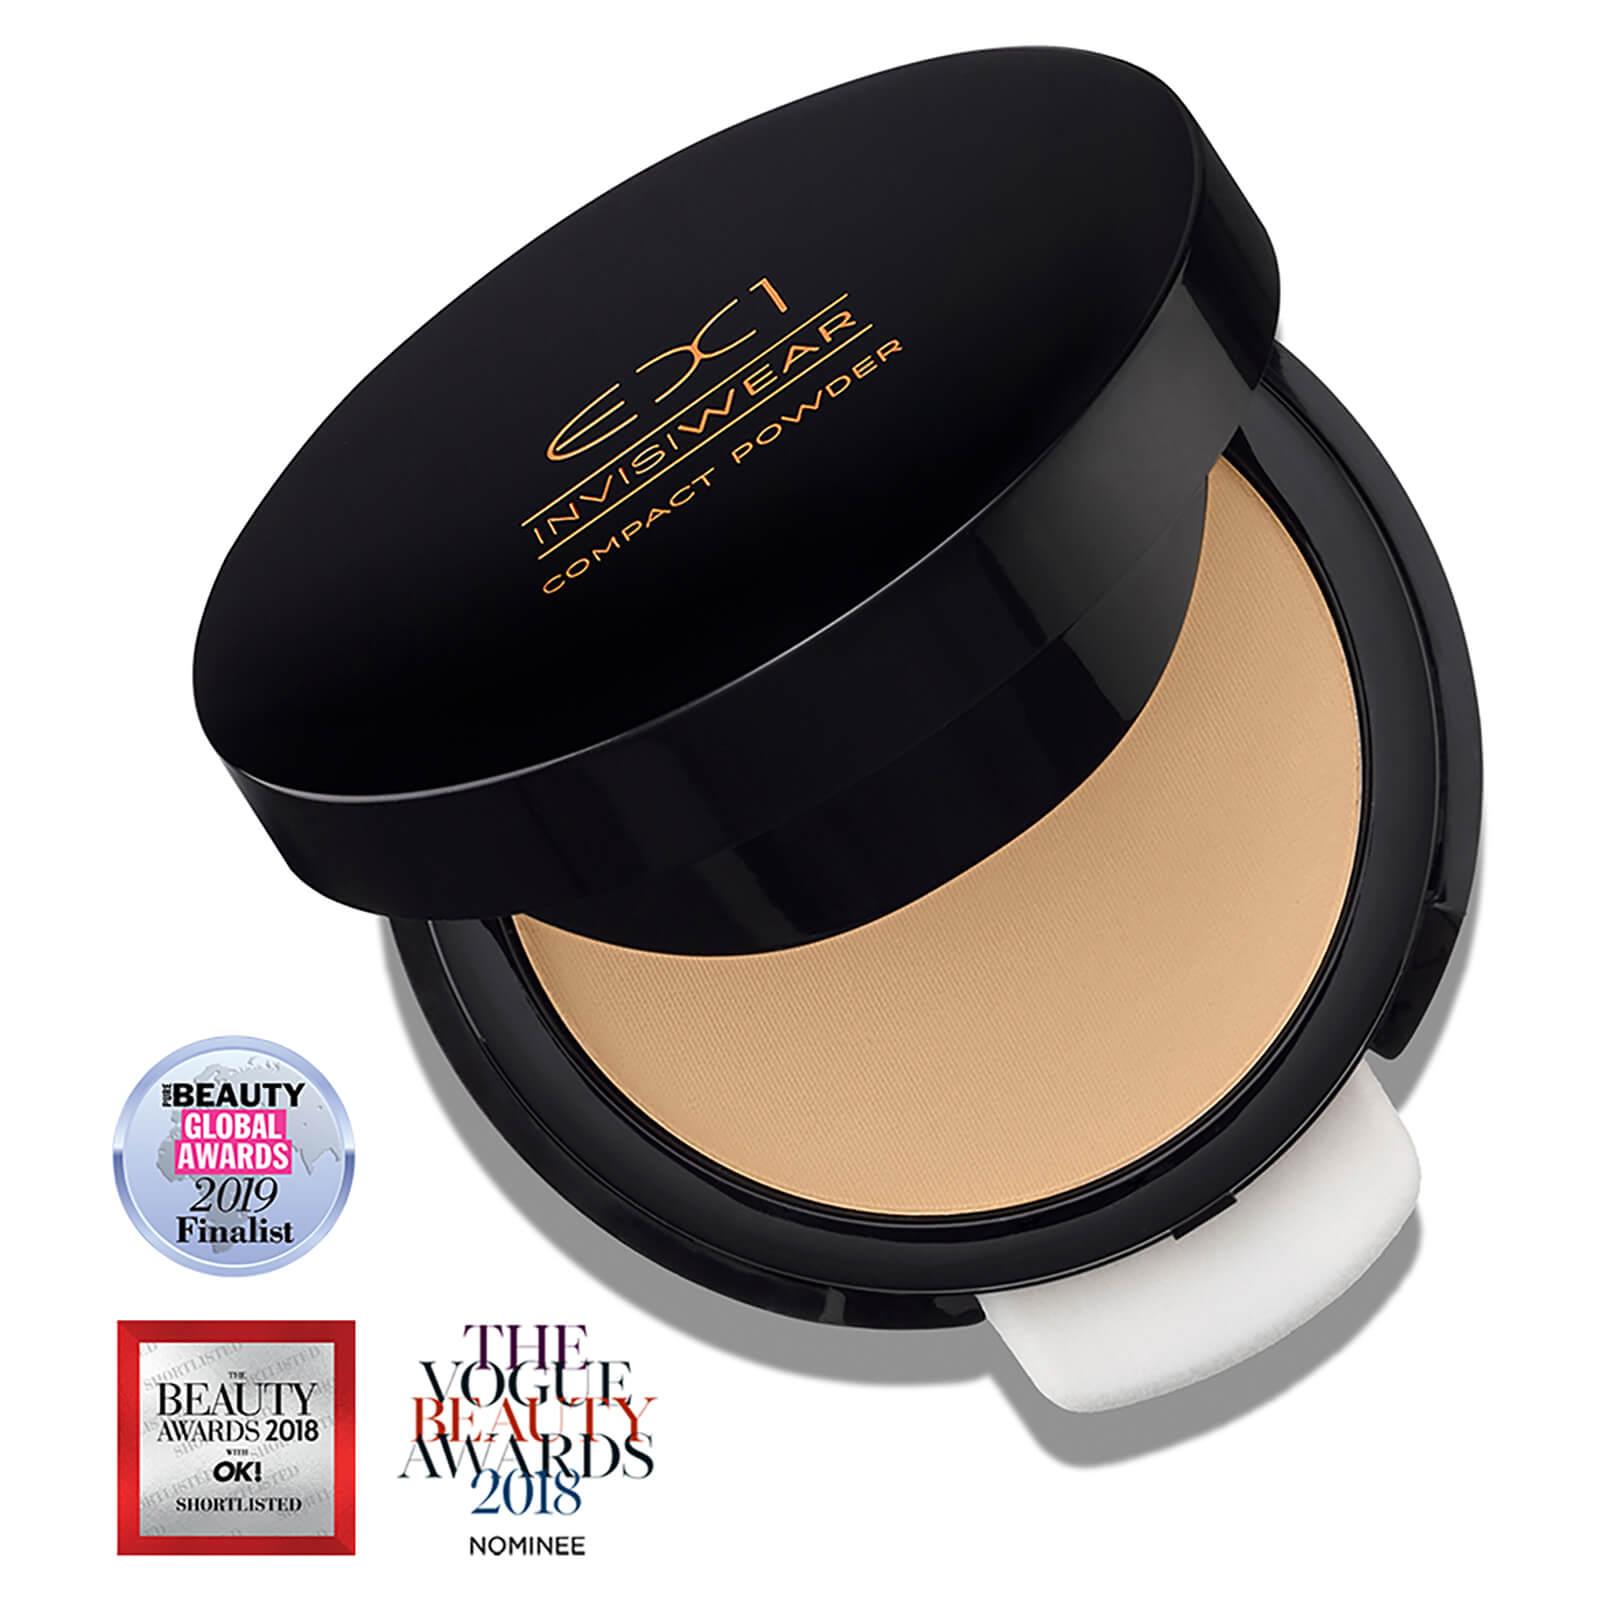 EX1 Cosmetics Compact Powder 9.5g (Various Shades) - 4.0